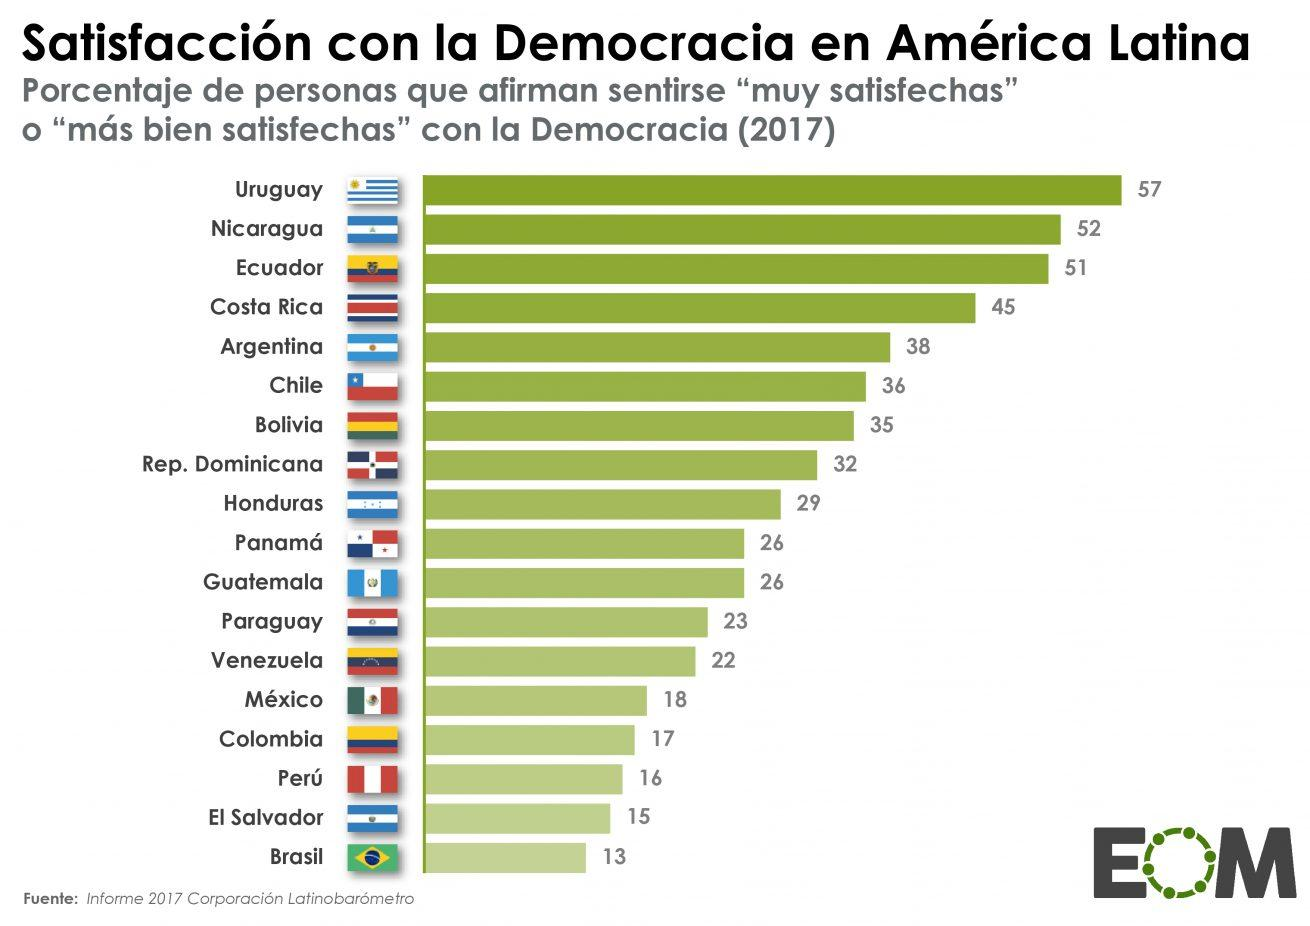 https://elordenmundial.com/wp-content/uploads/2018/10/Am%C3%A9rica-Latina-Pol%C3%ADtica-Satisfacci%C3%B3n-con-la-democracia-en-Am%C3%A9rica-Latina-1310x926.jpg